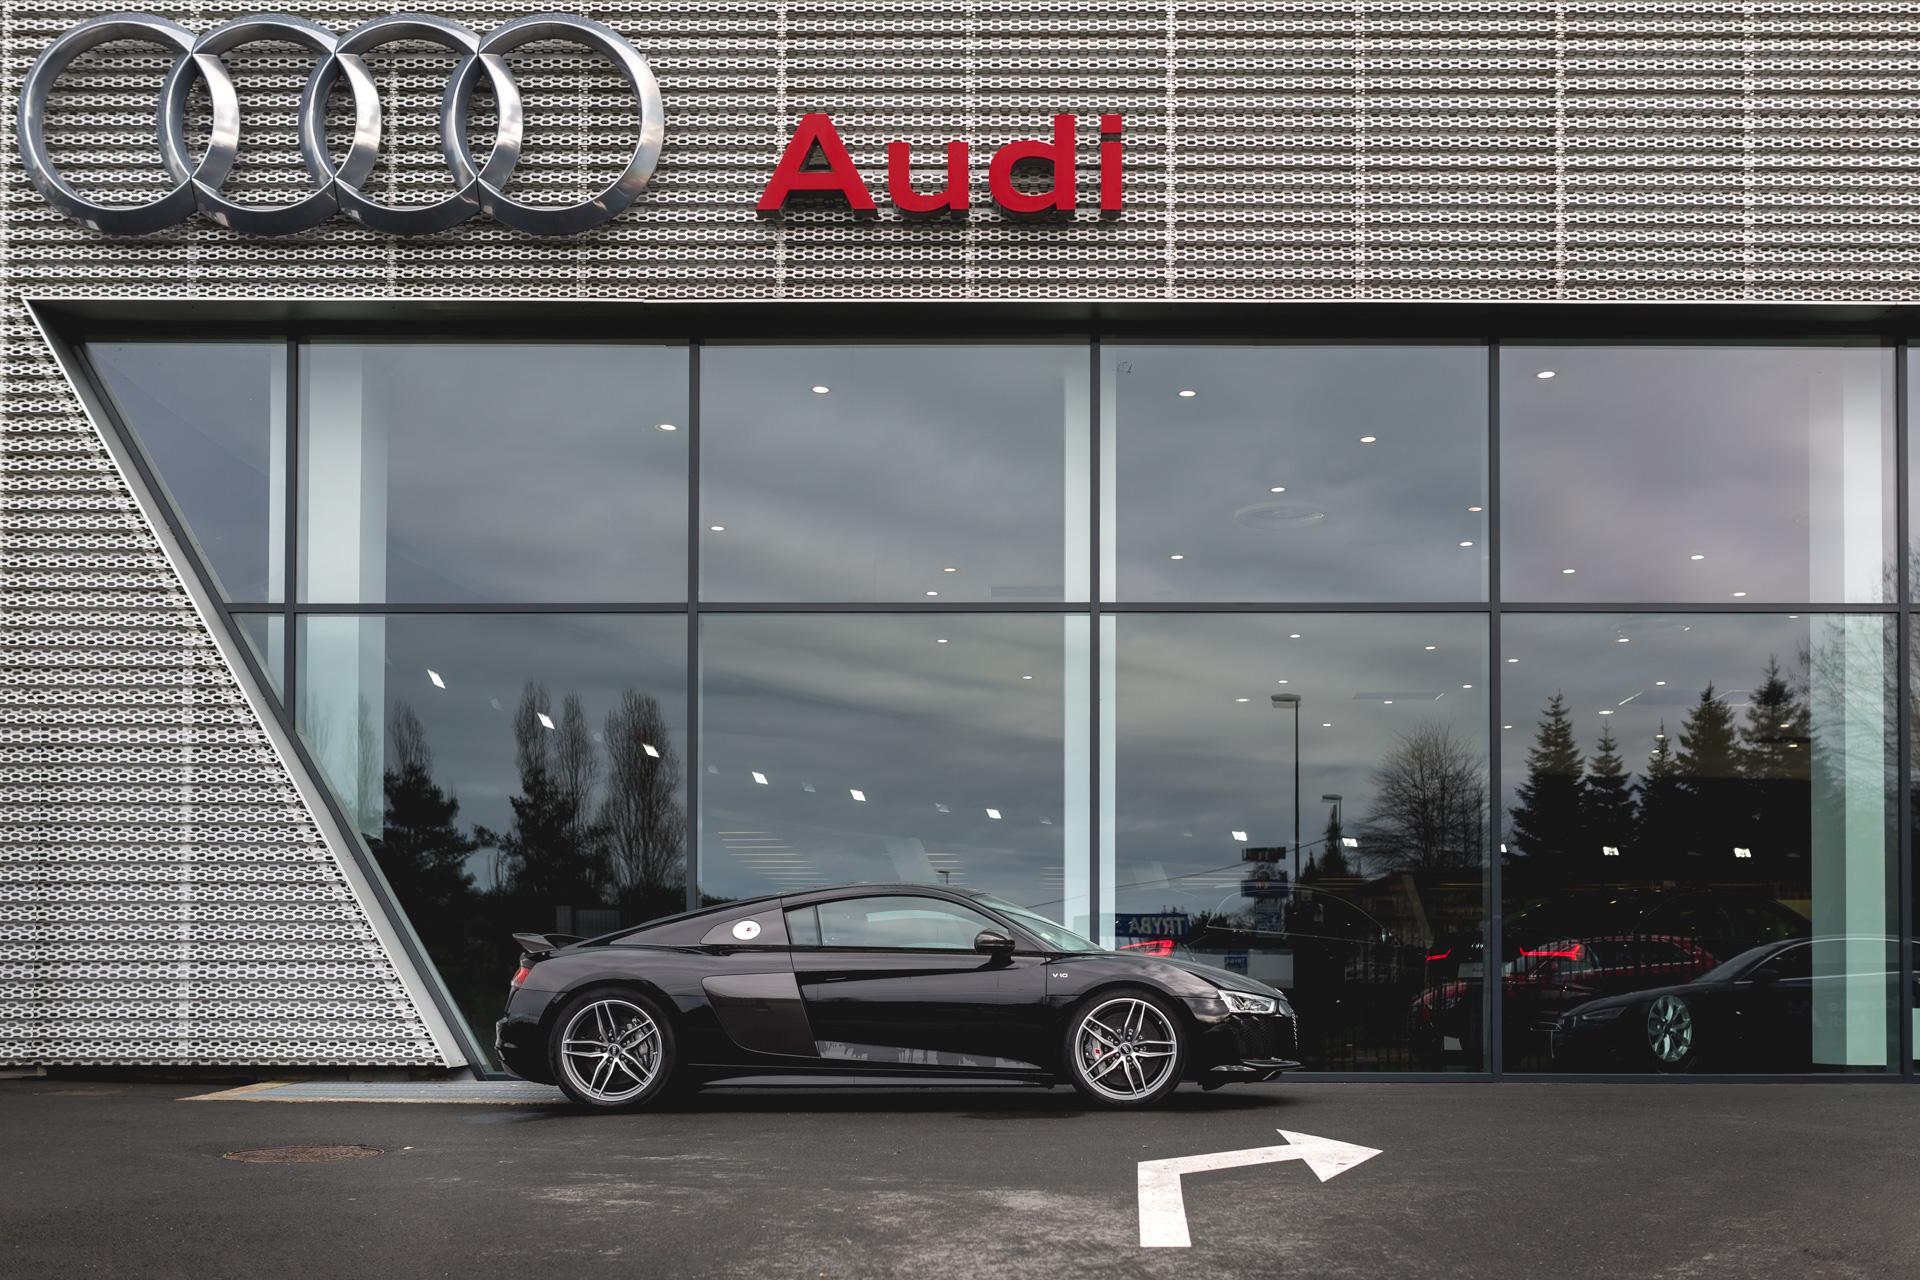 Damien-Dohmen-Photographe-Audi-15